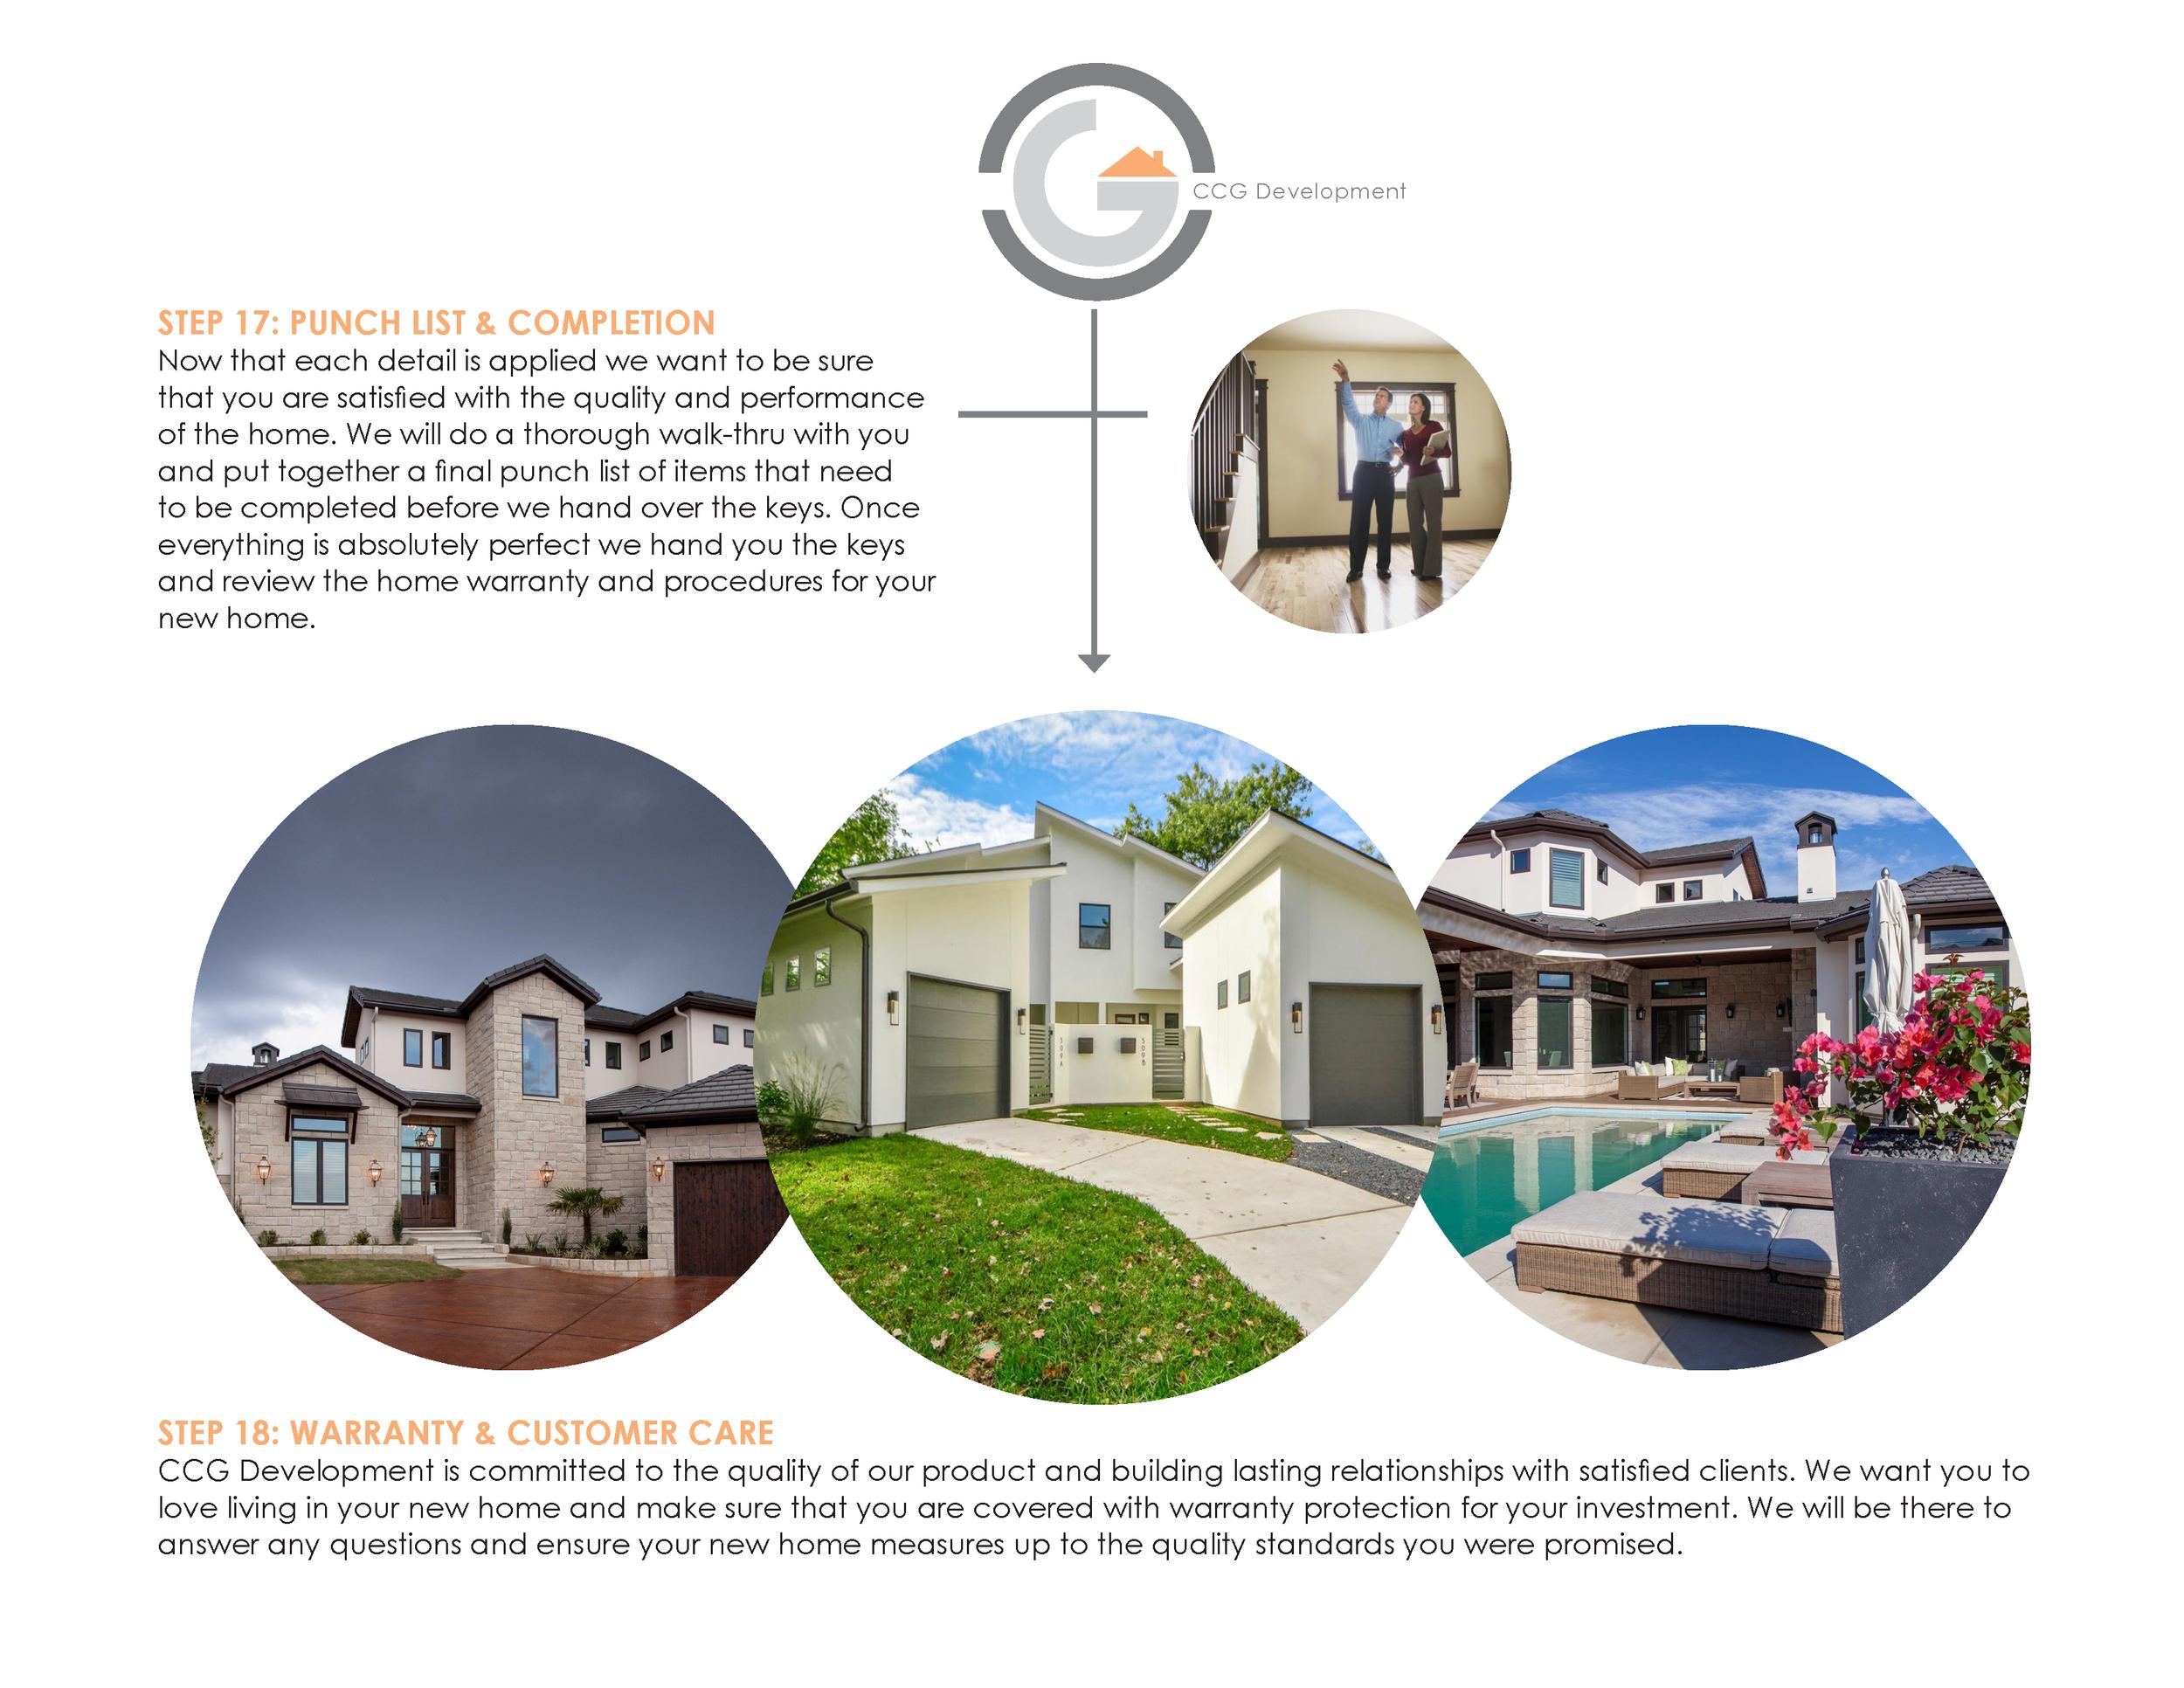 CCG Development Custom Home Process Chart V2 - Slides_Page_6.png